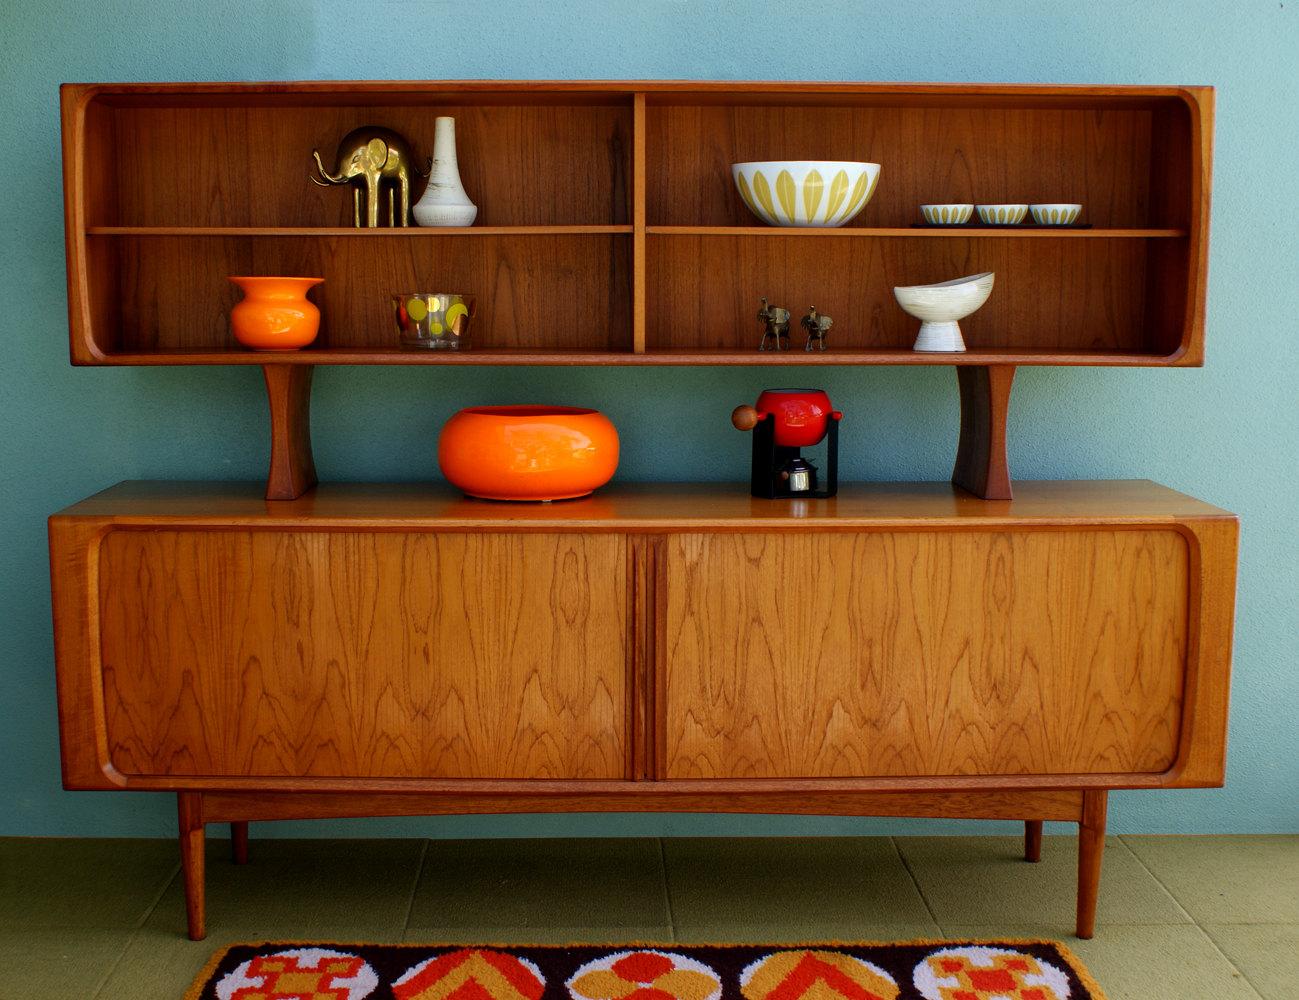 Distinctive Sideboard Design With Top Shelves Unique Pattern Carpet Bright Orange Ornament Items Gold Elephant Miniature